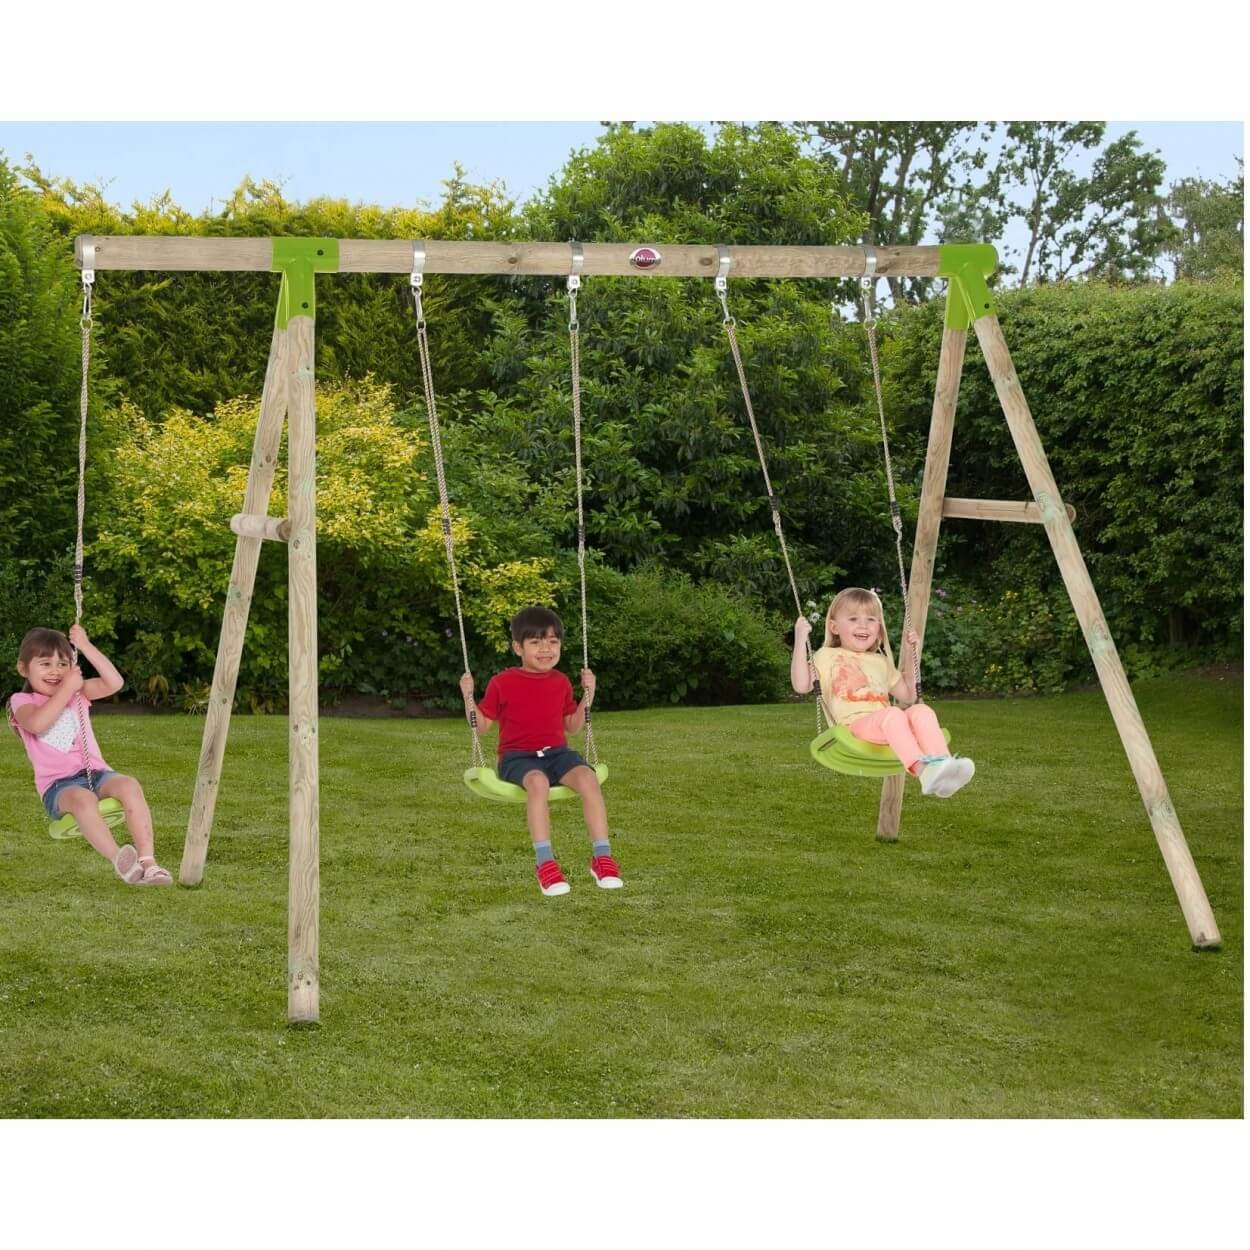 Plum Loris Wooden Swing Set with FREE Protekamats (Pack of 2)